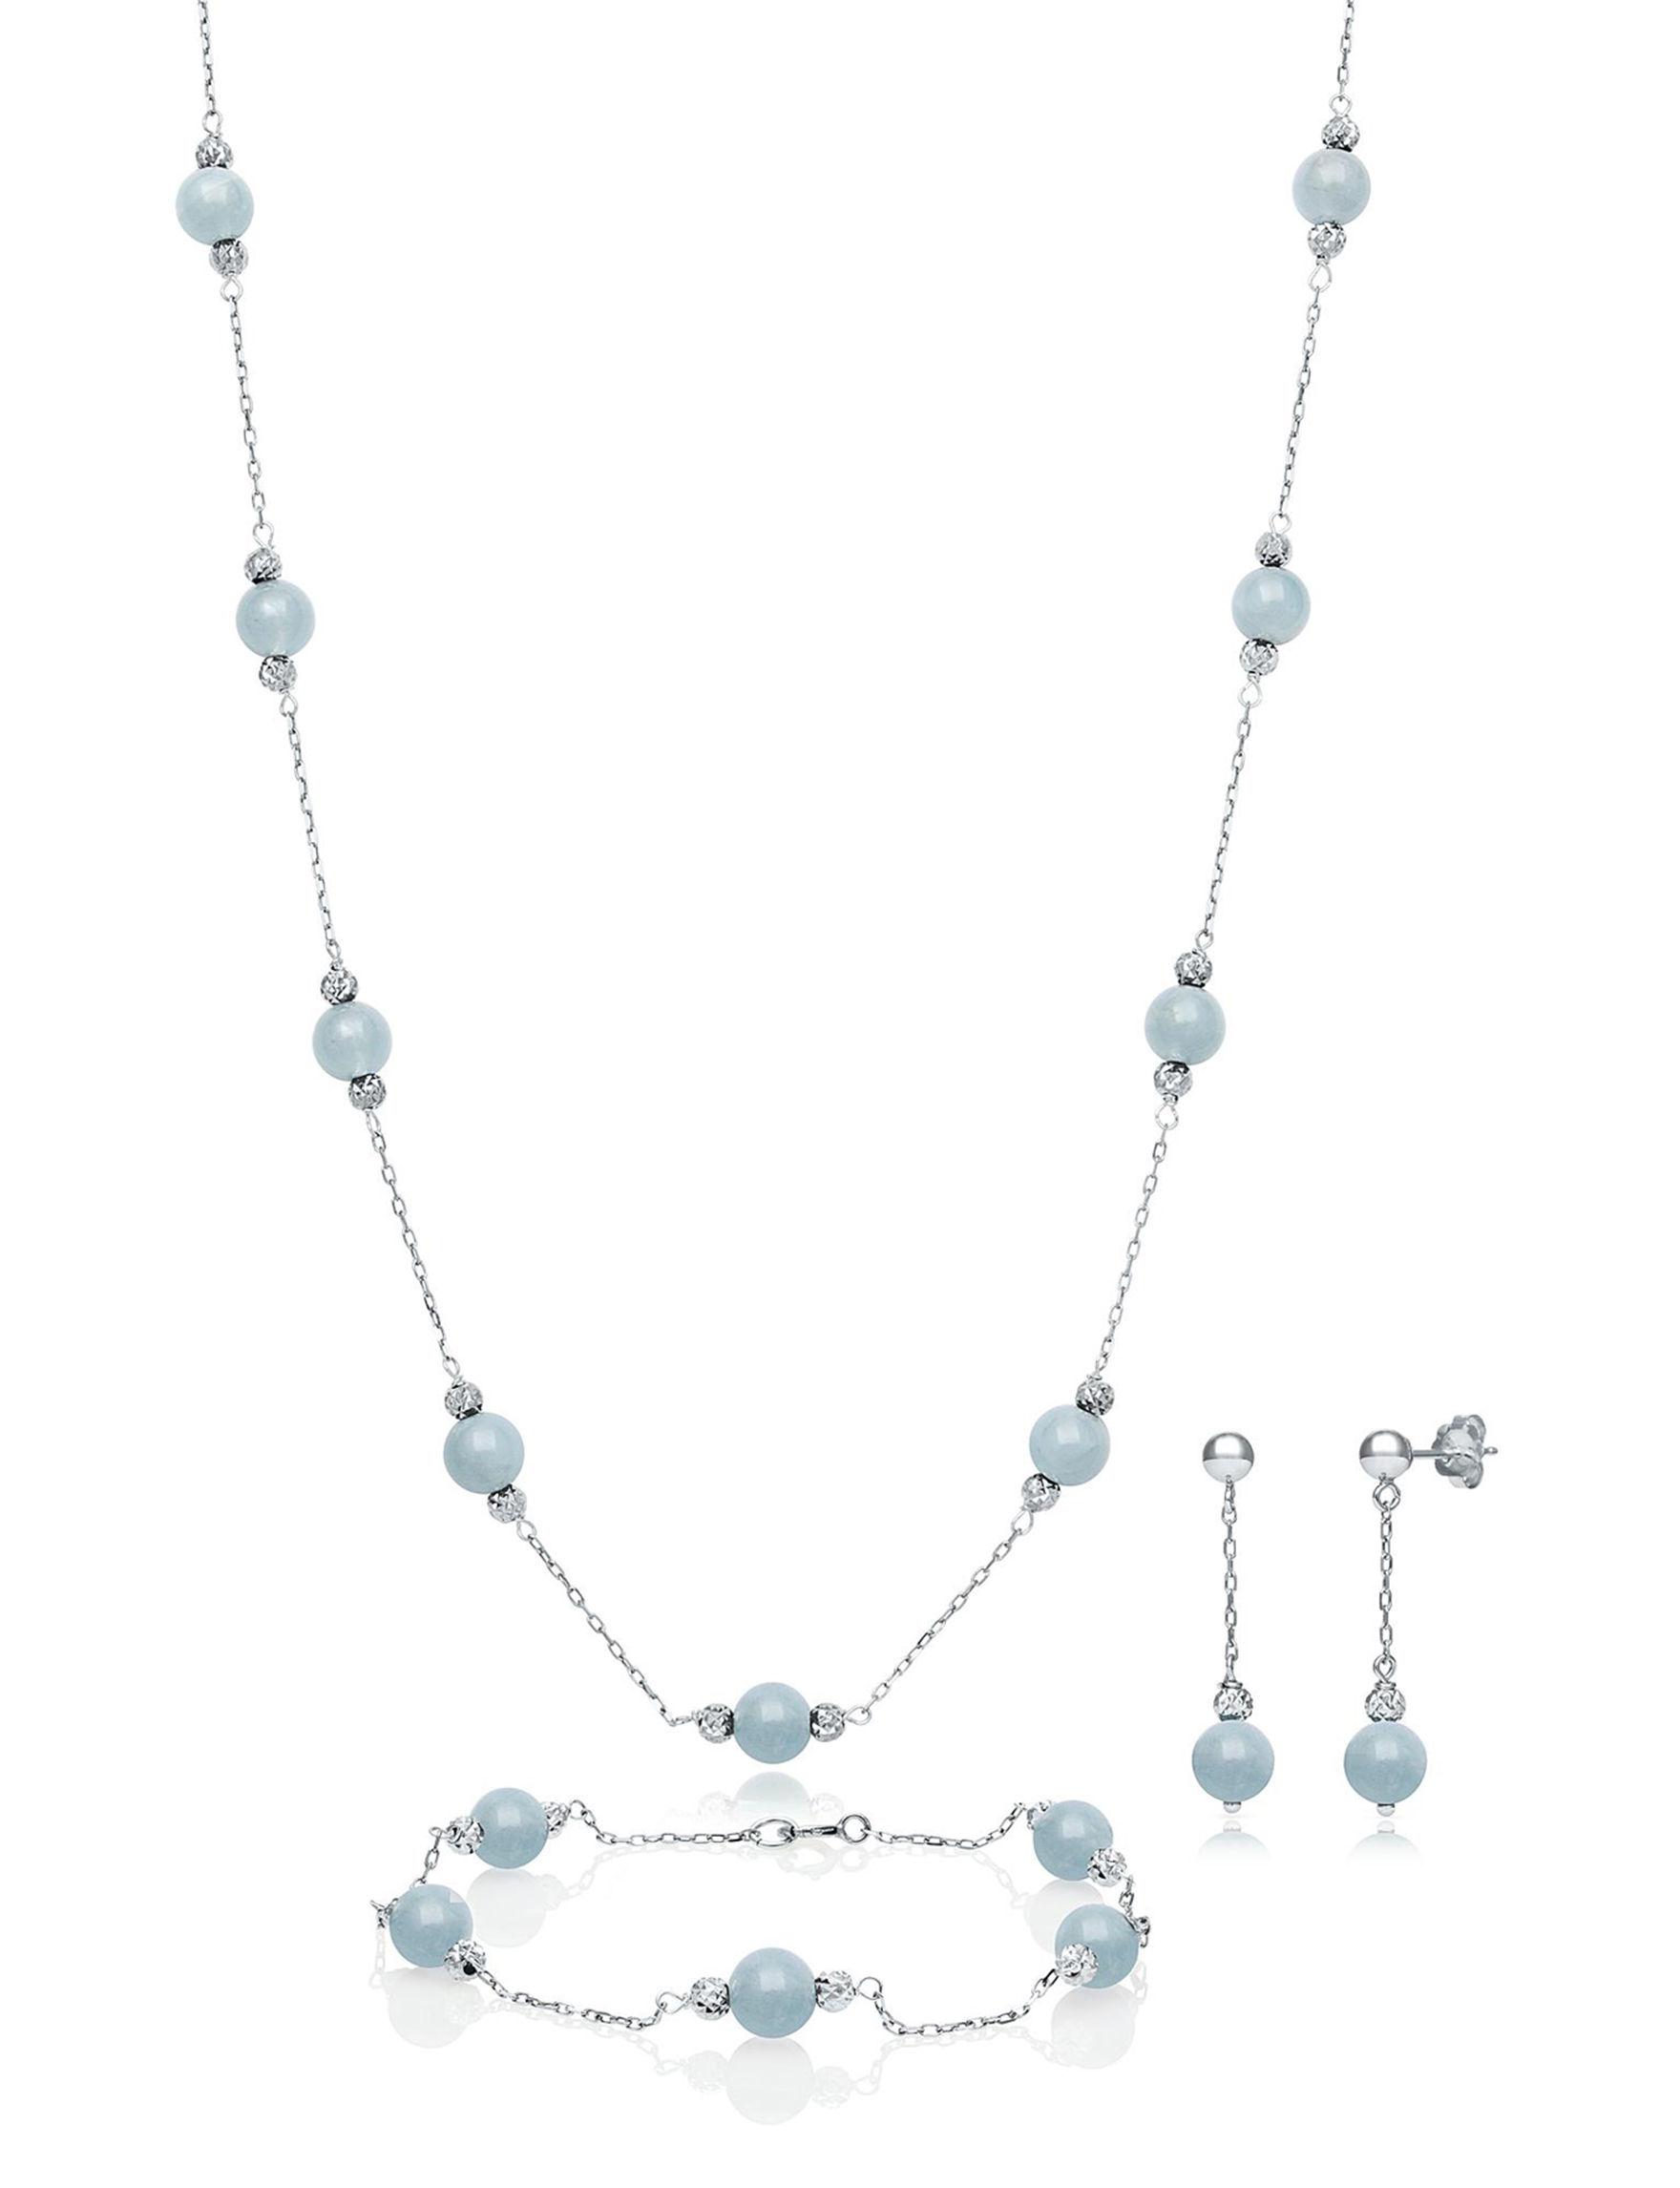 CPI Blue / Silver Jewelry Sets Fine Jewelry